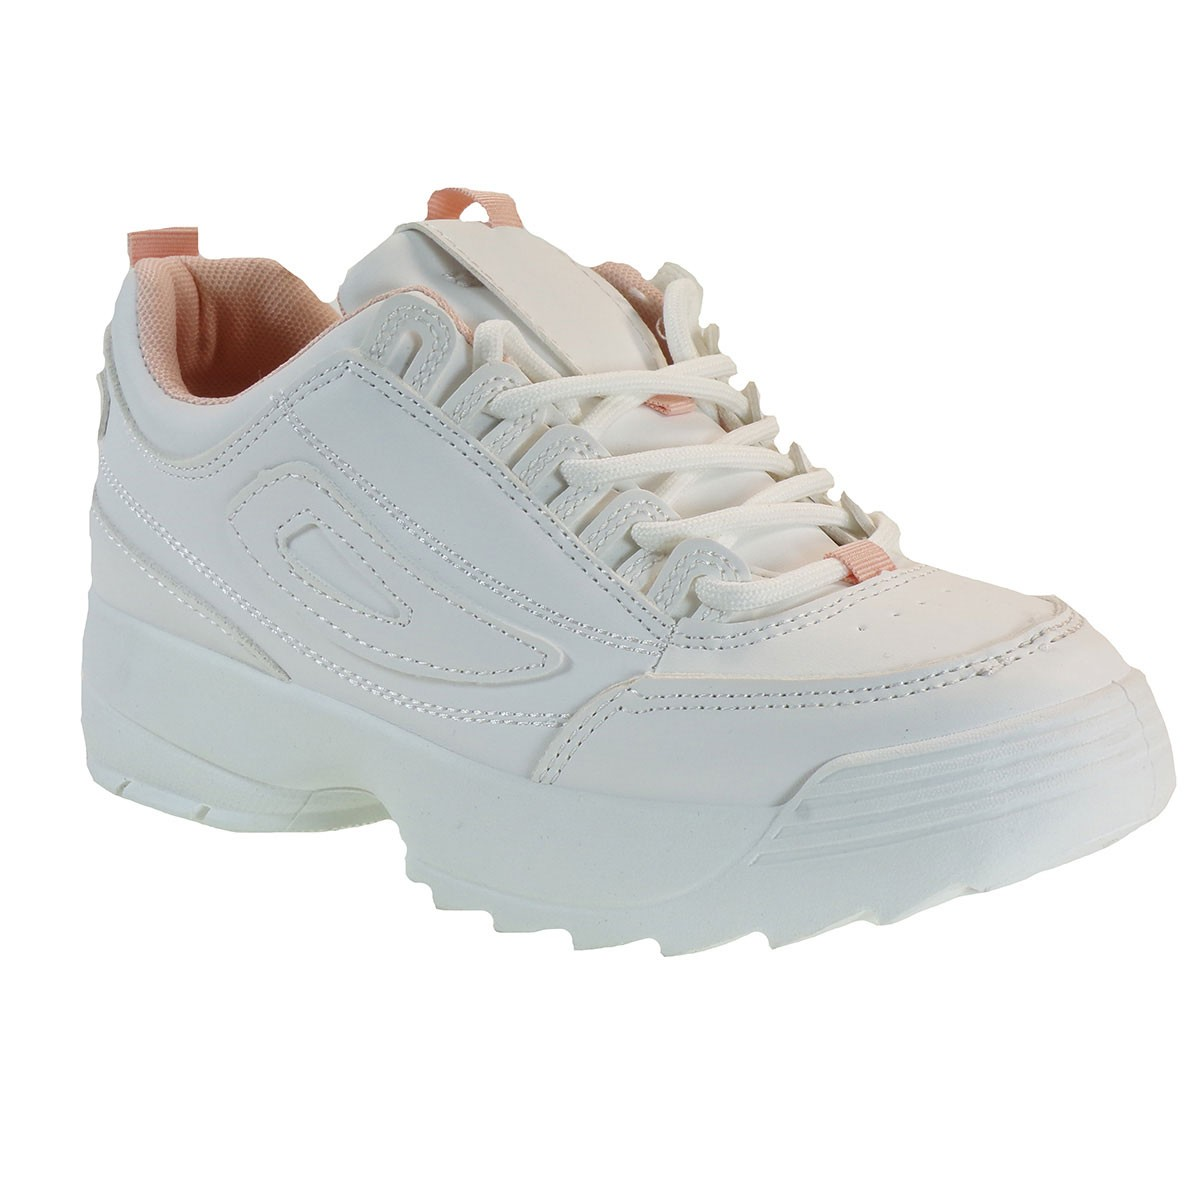 Bagiota Shoes Γυναικεία Παπούτσια Sneakers Αθλητικά Β180 Λευκό-Ρόζ